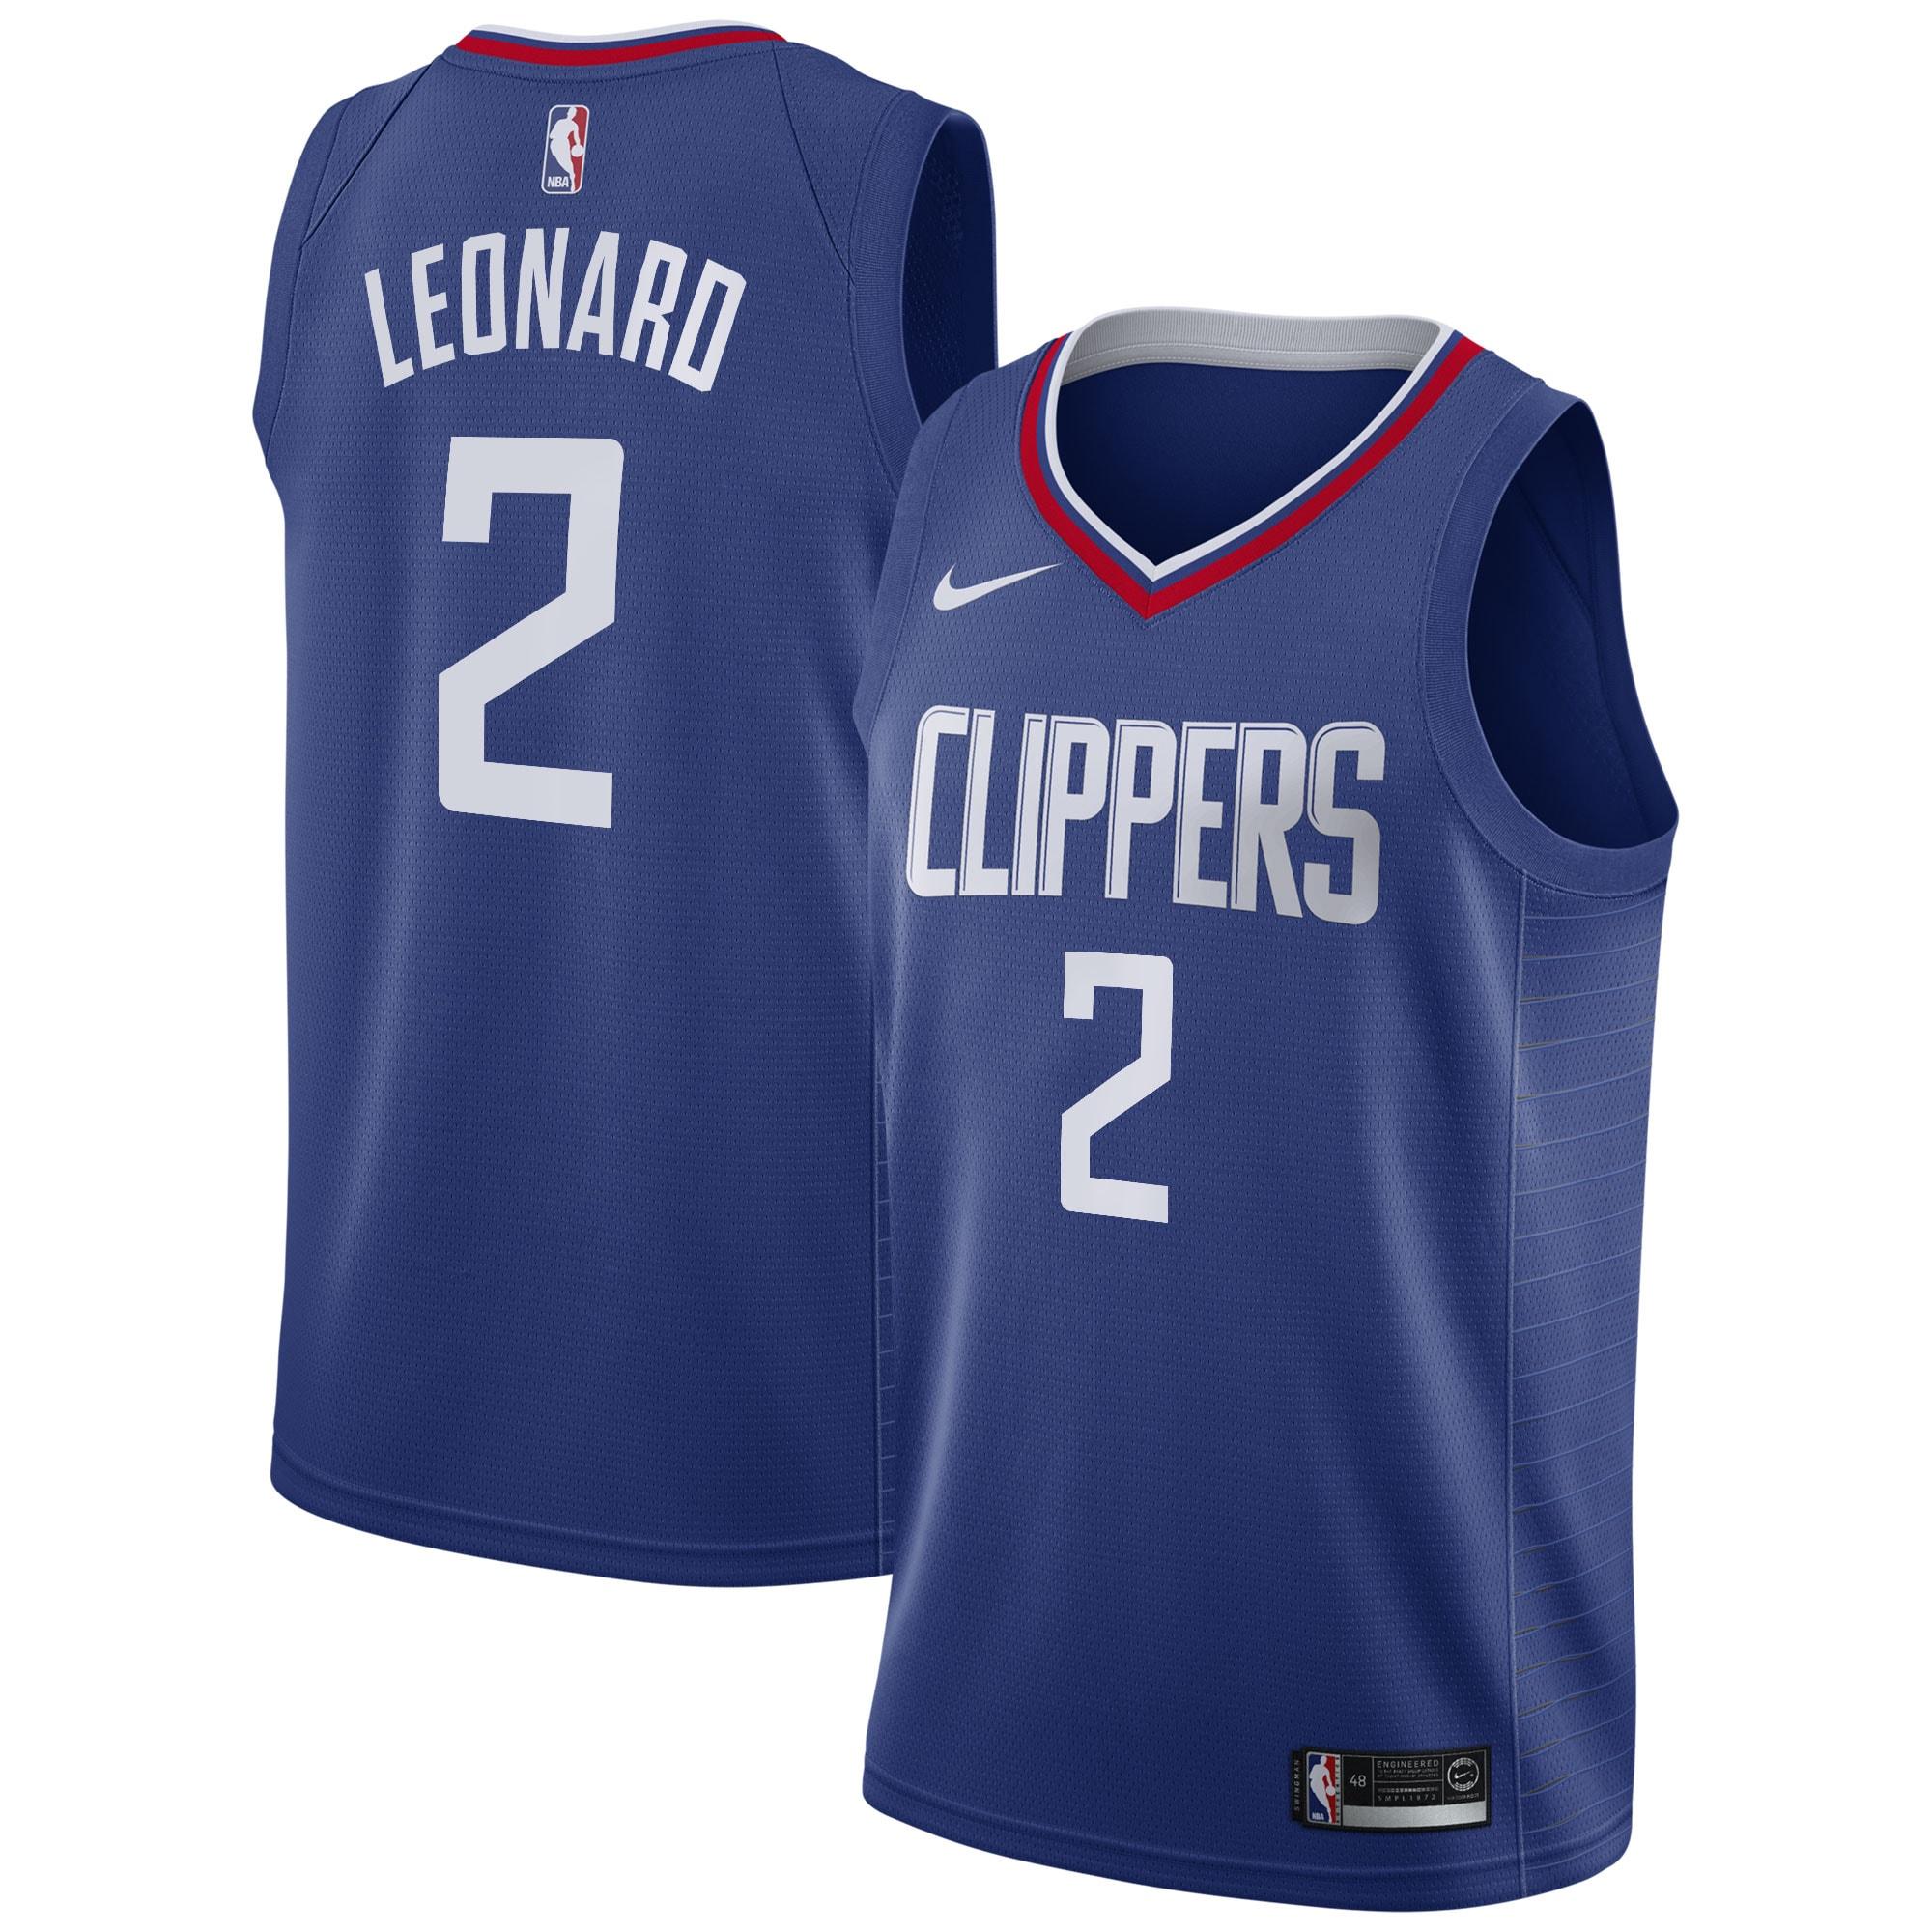 Kawhi Leonard LA Clippers Nike 2019/20 Swingman Jersey Blue - Icon Edition